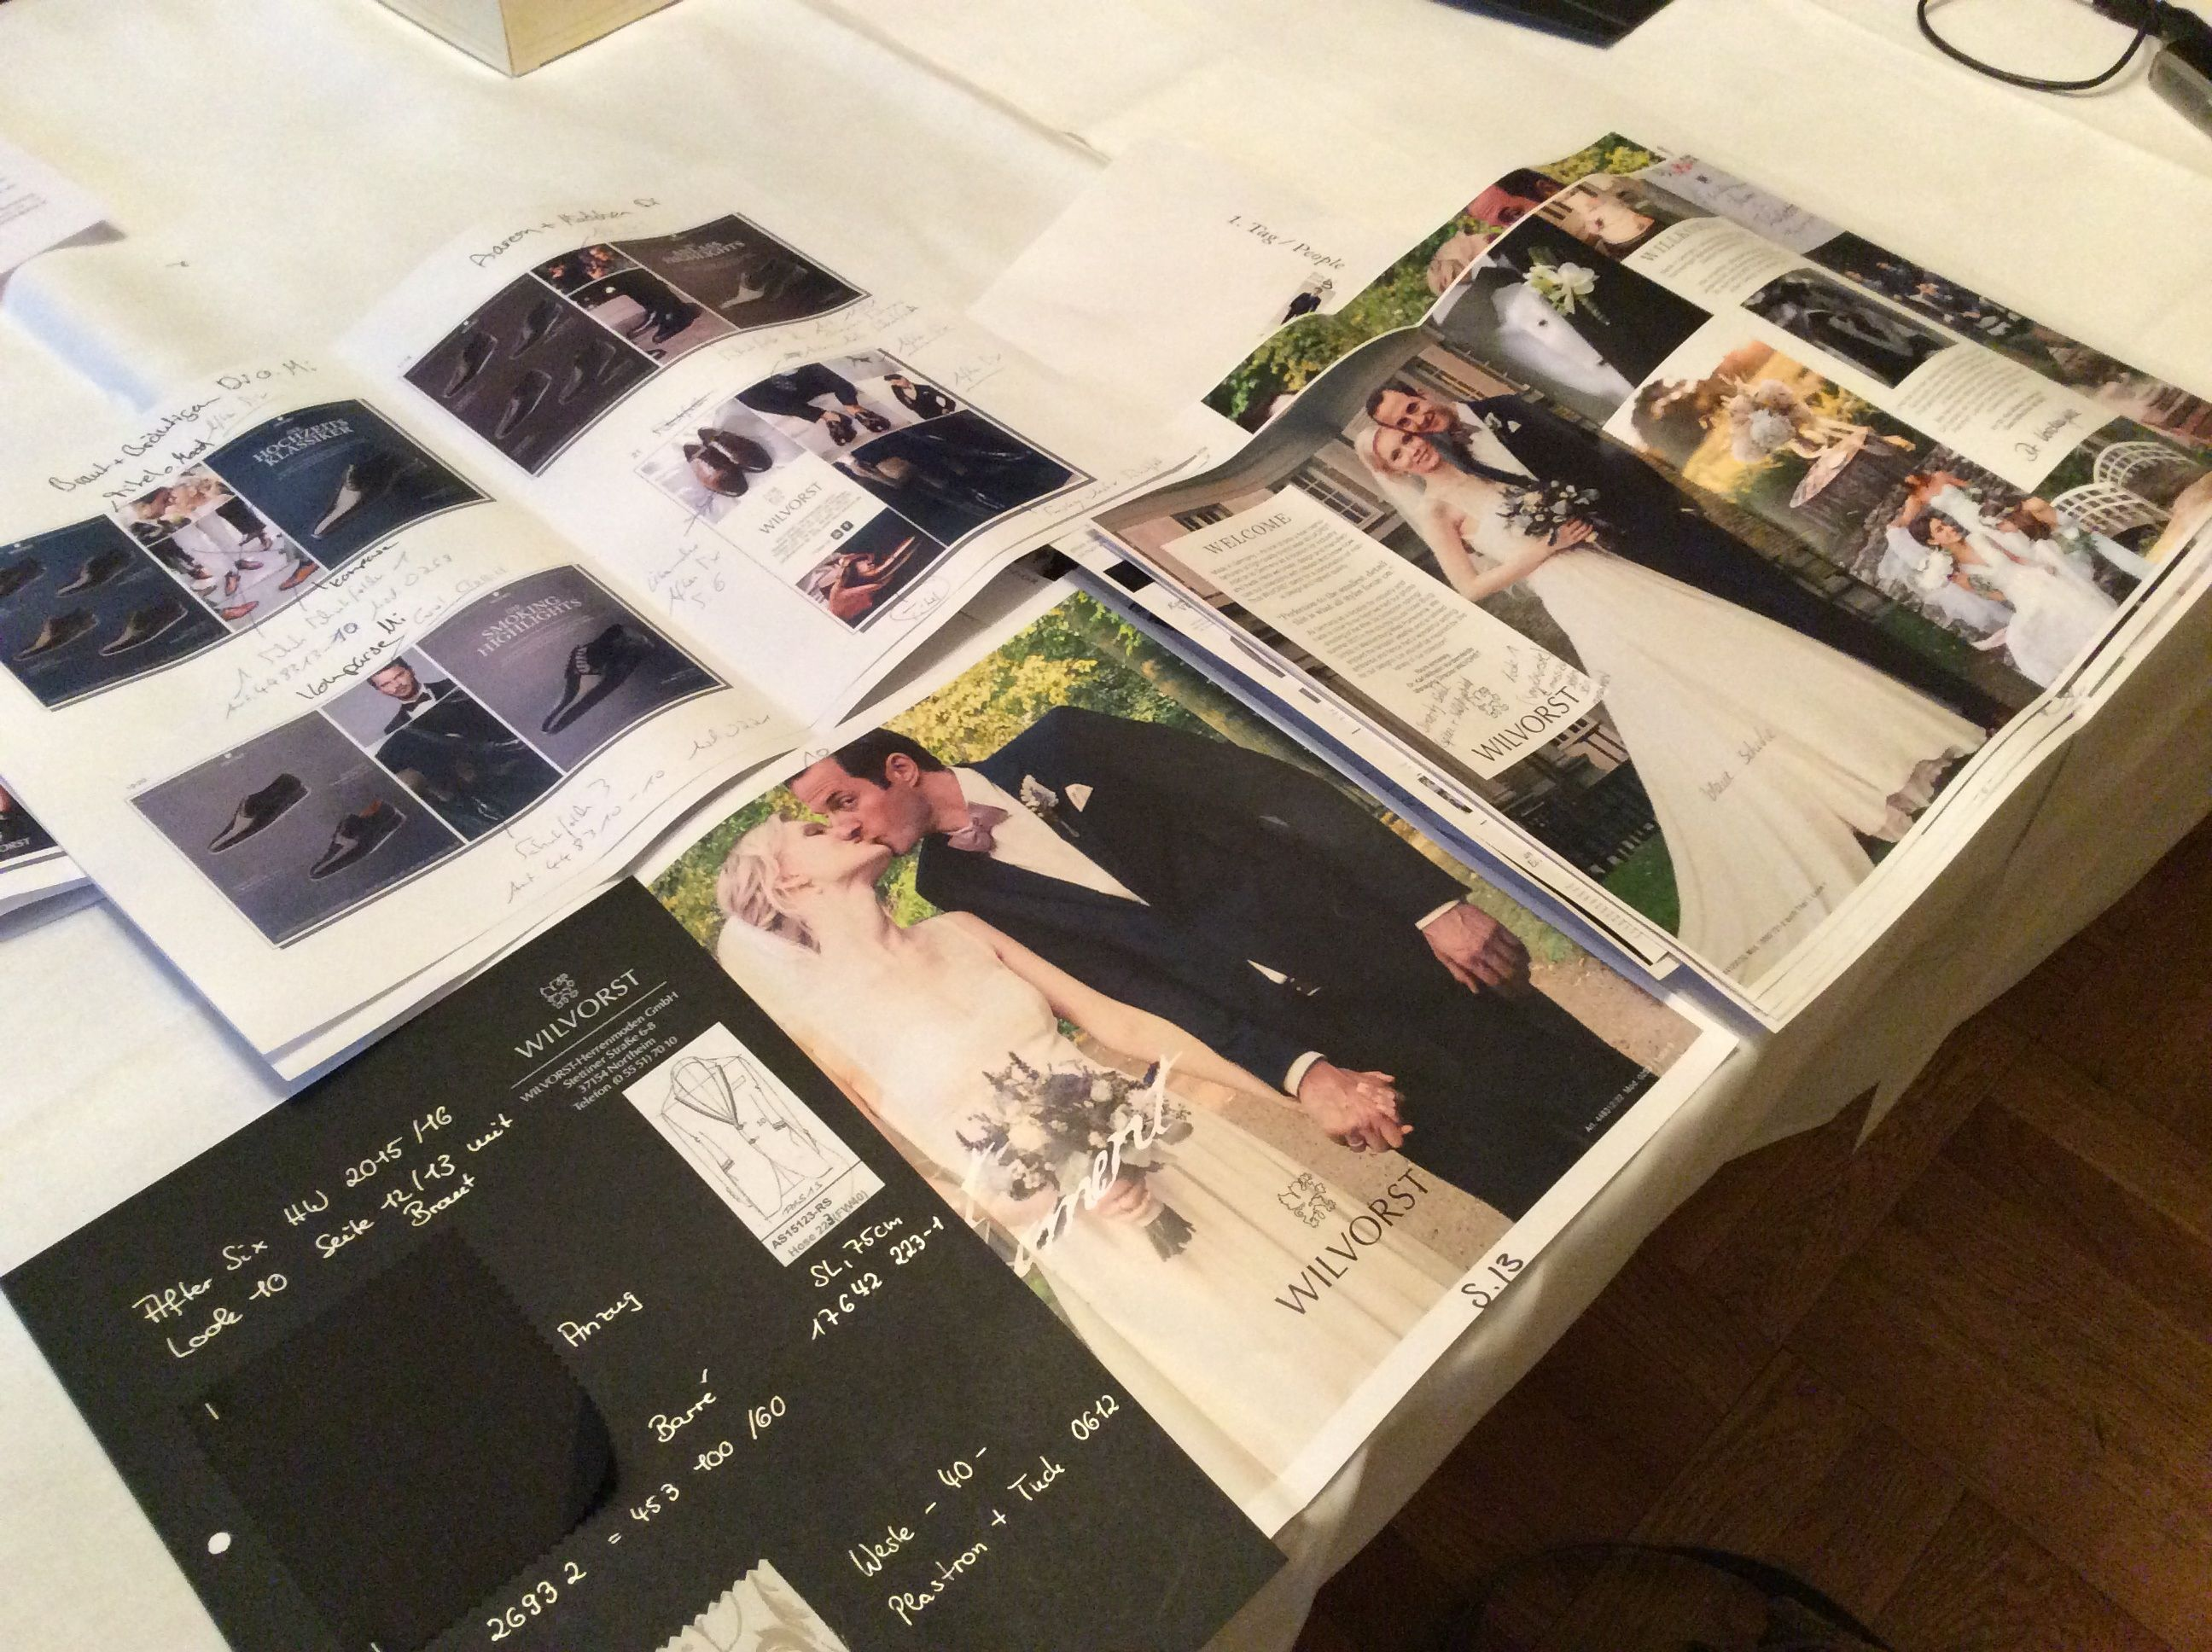 WILVORST After Six Shooting| www.wilvorst.de #WILVORST #Anzug #suit #Hochzeit #wedding #suitup #weddingdress #groom #bride #trends2015 #Inspiration #makingof